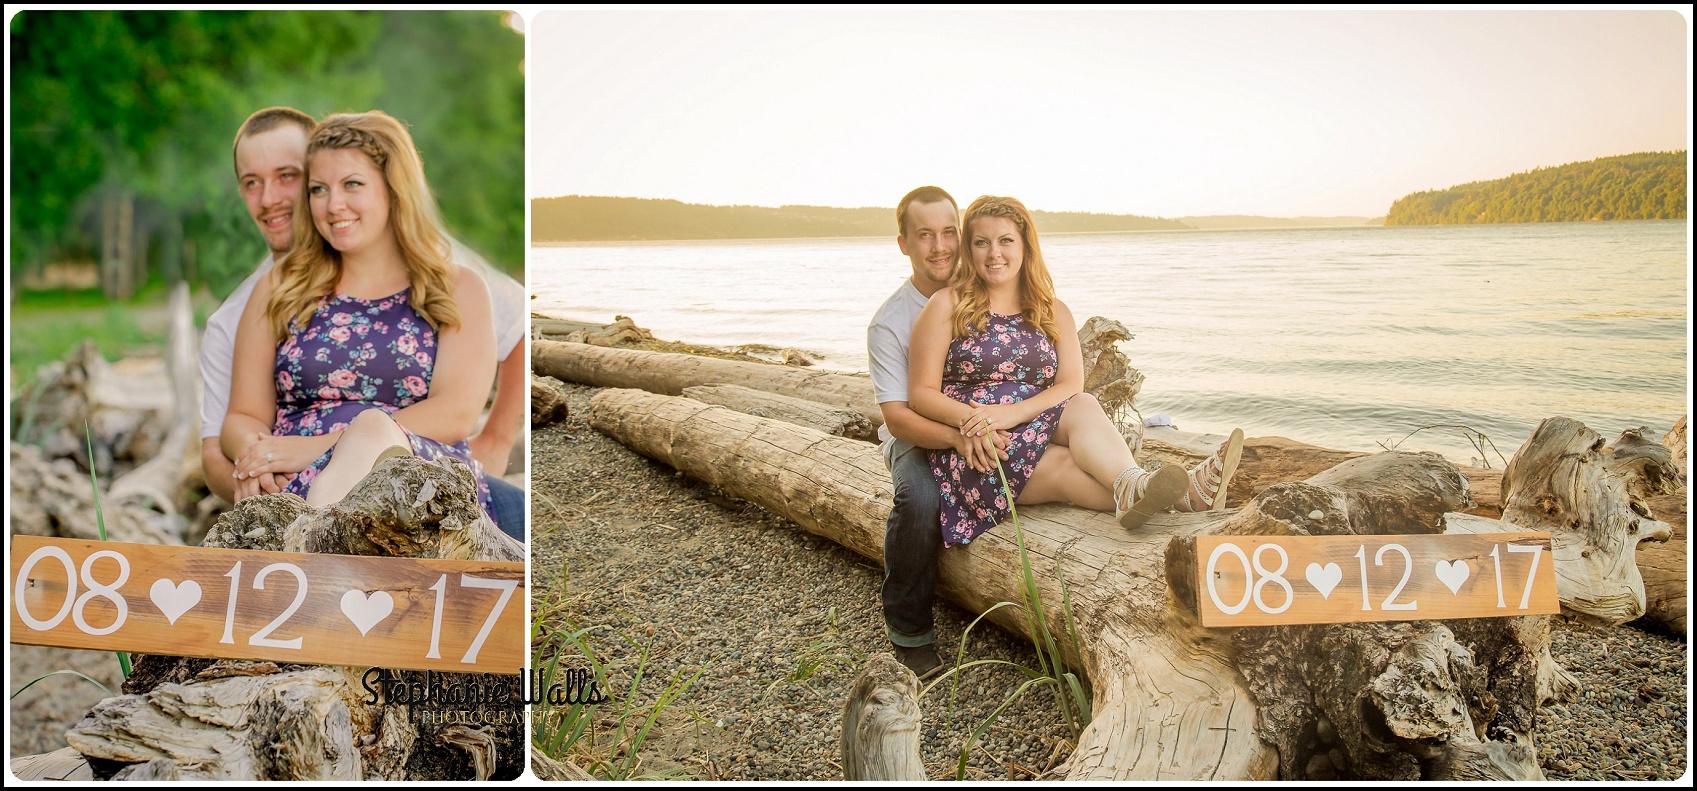 marissa   dustin085 Point Defiance Park Engagement with Marissa and Dustin